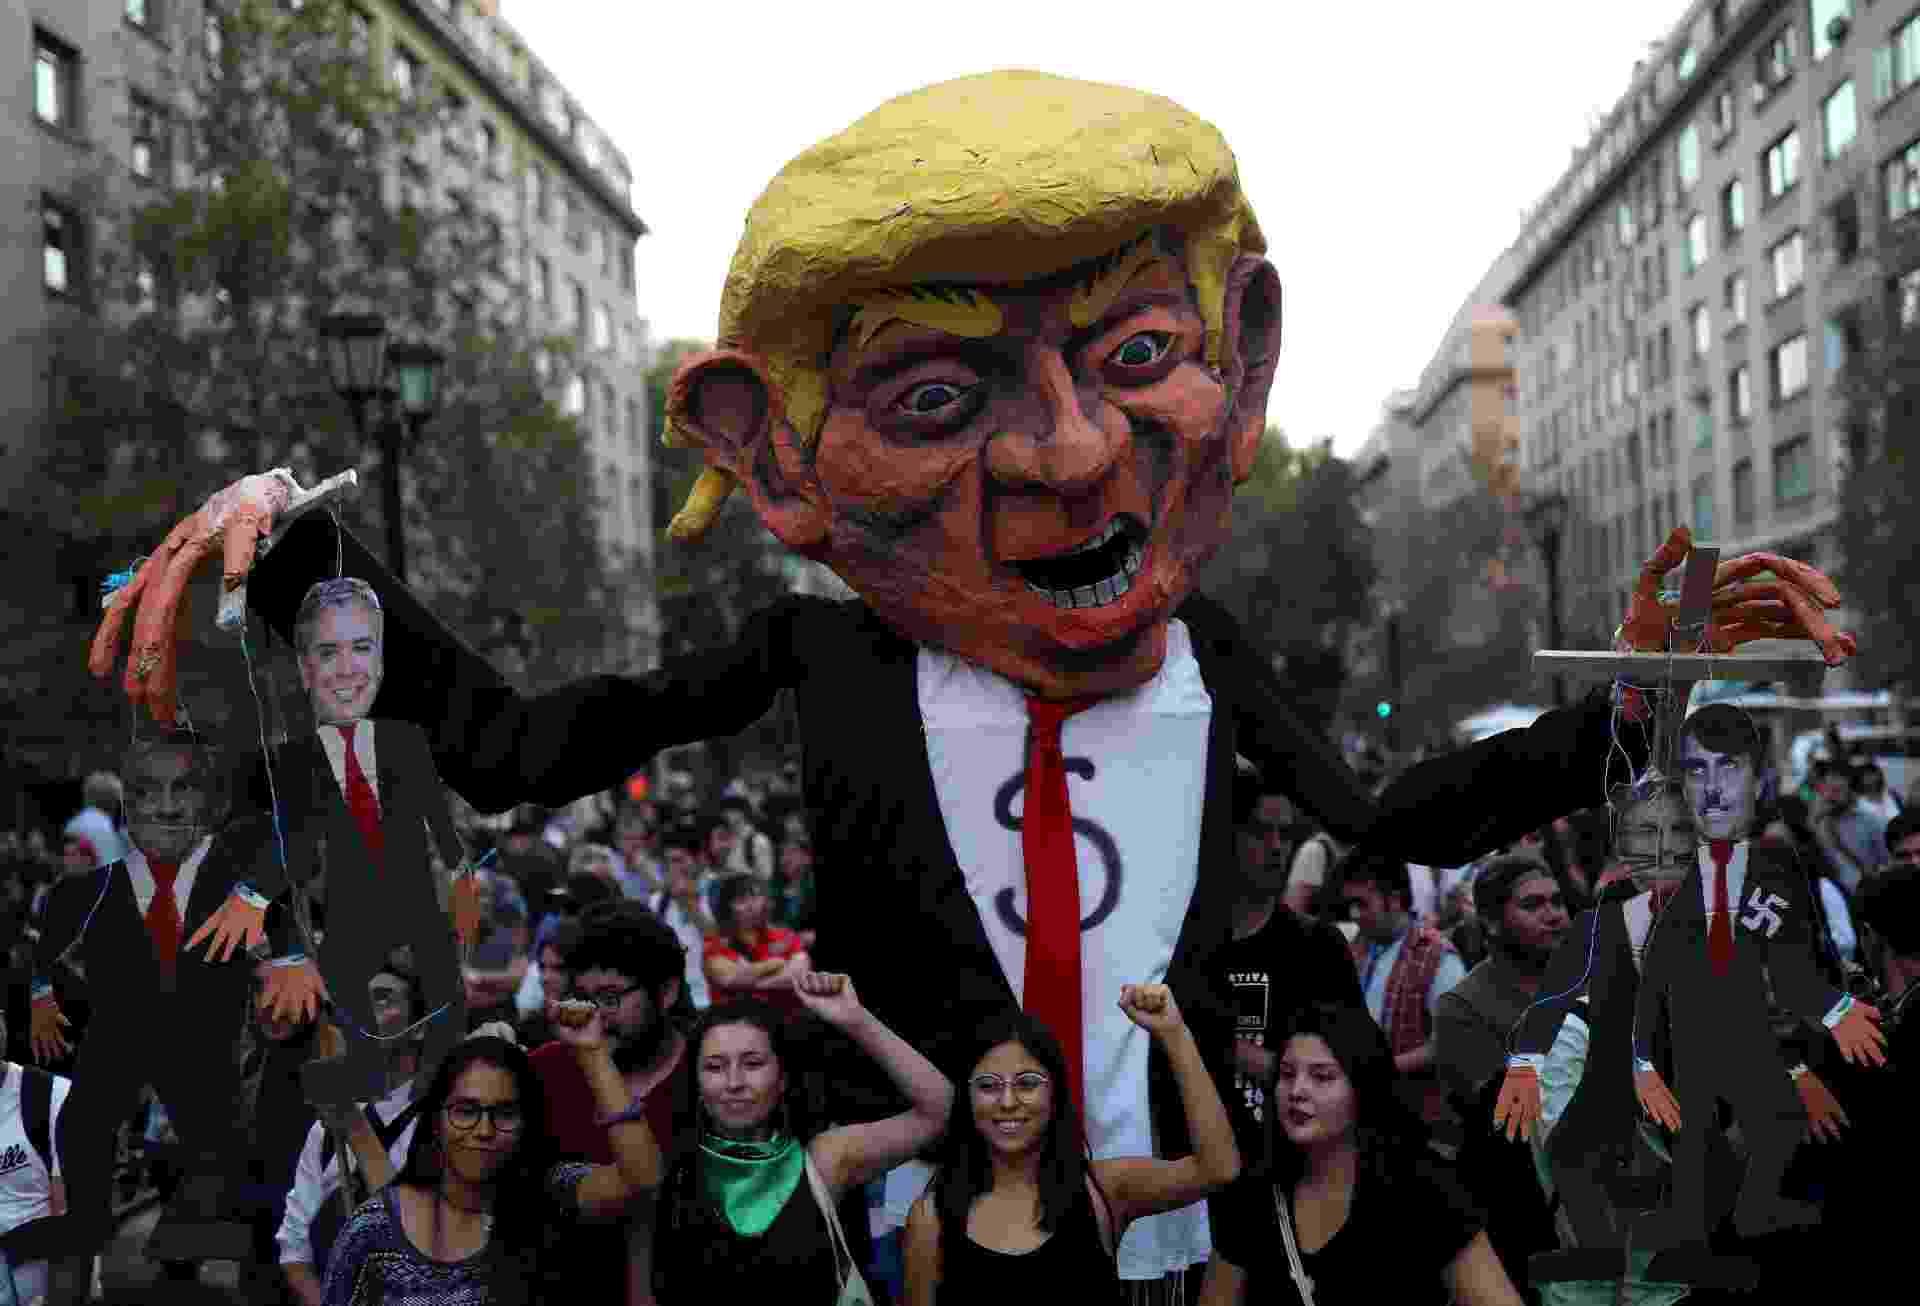 Manifestantes levaram boneco de Trump para protesto contra Bolsonaro em Santiago, capital chilena - REUTERS/Pablo Sanhueza